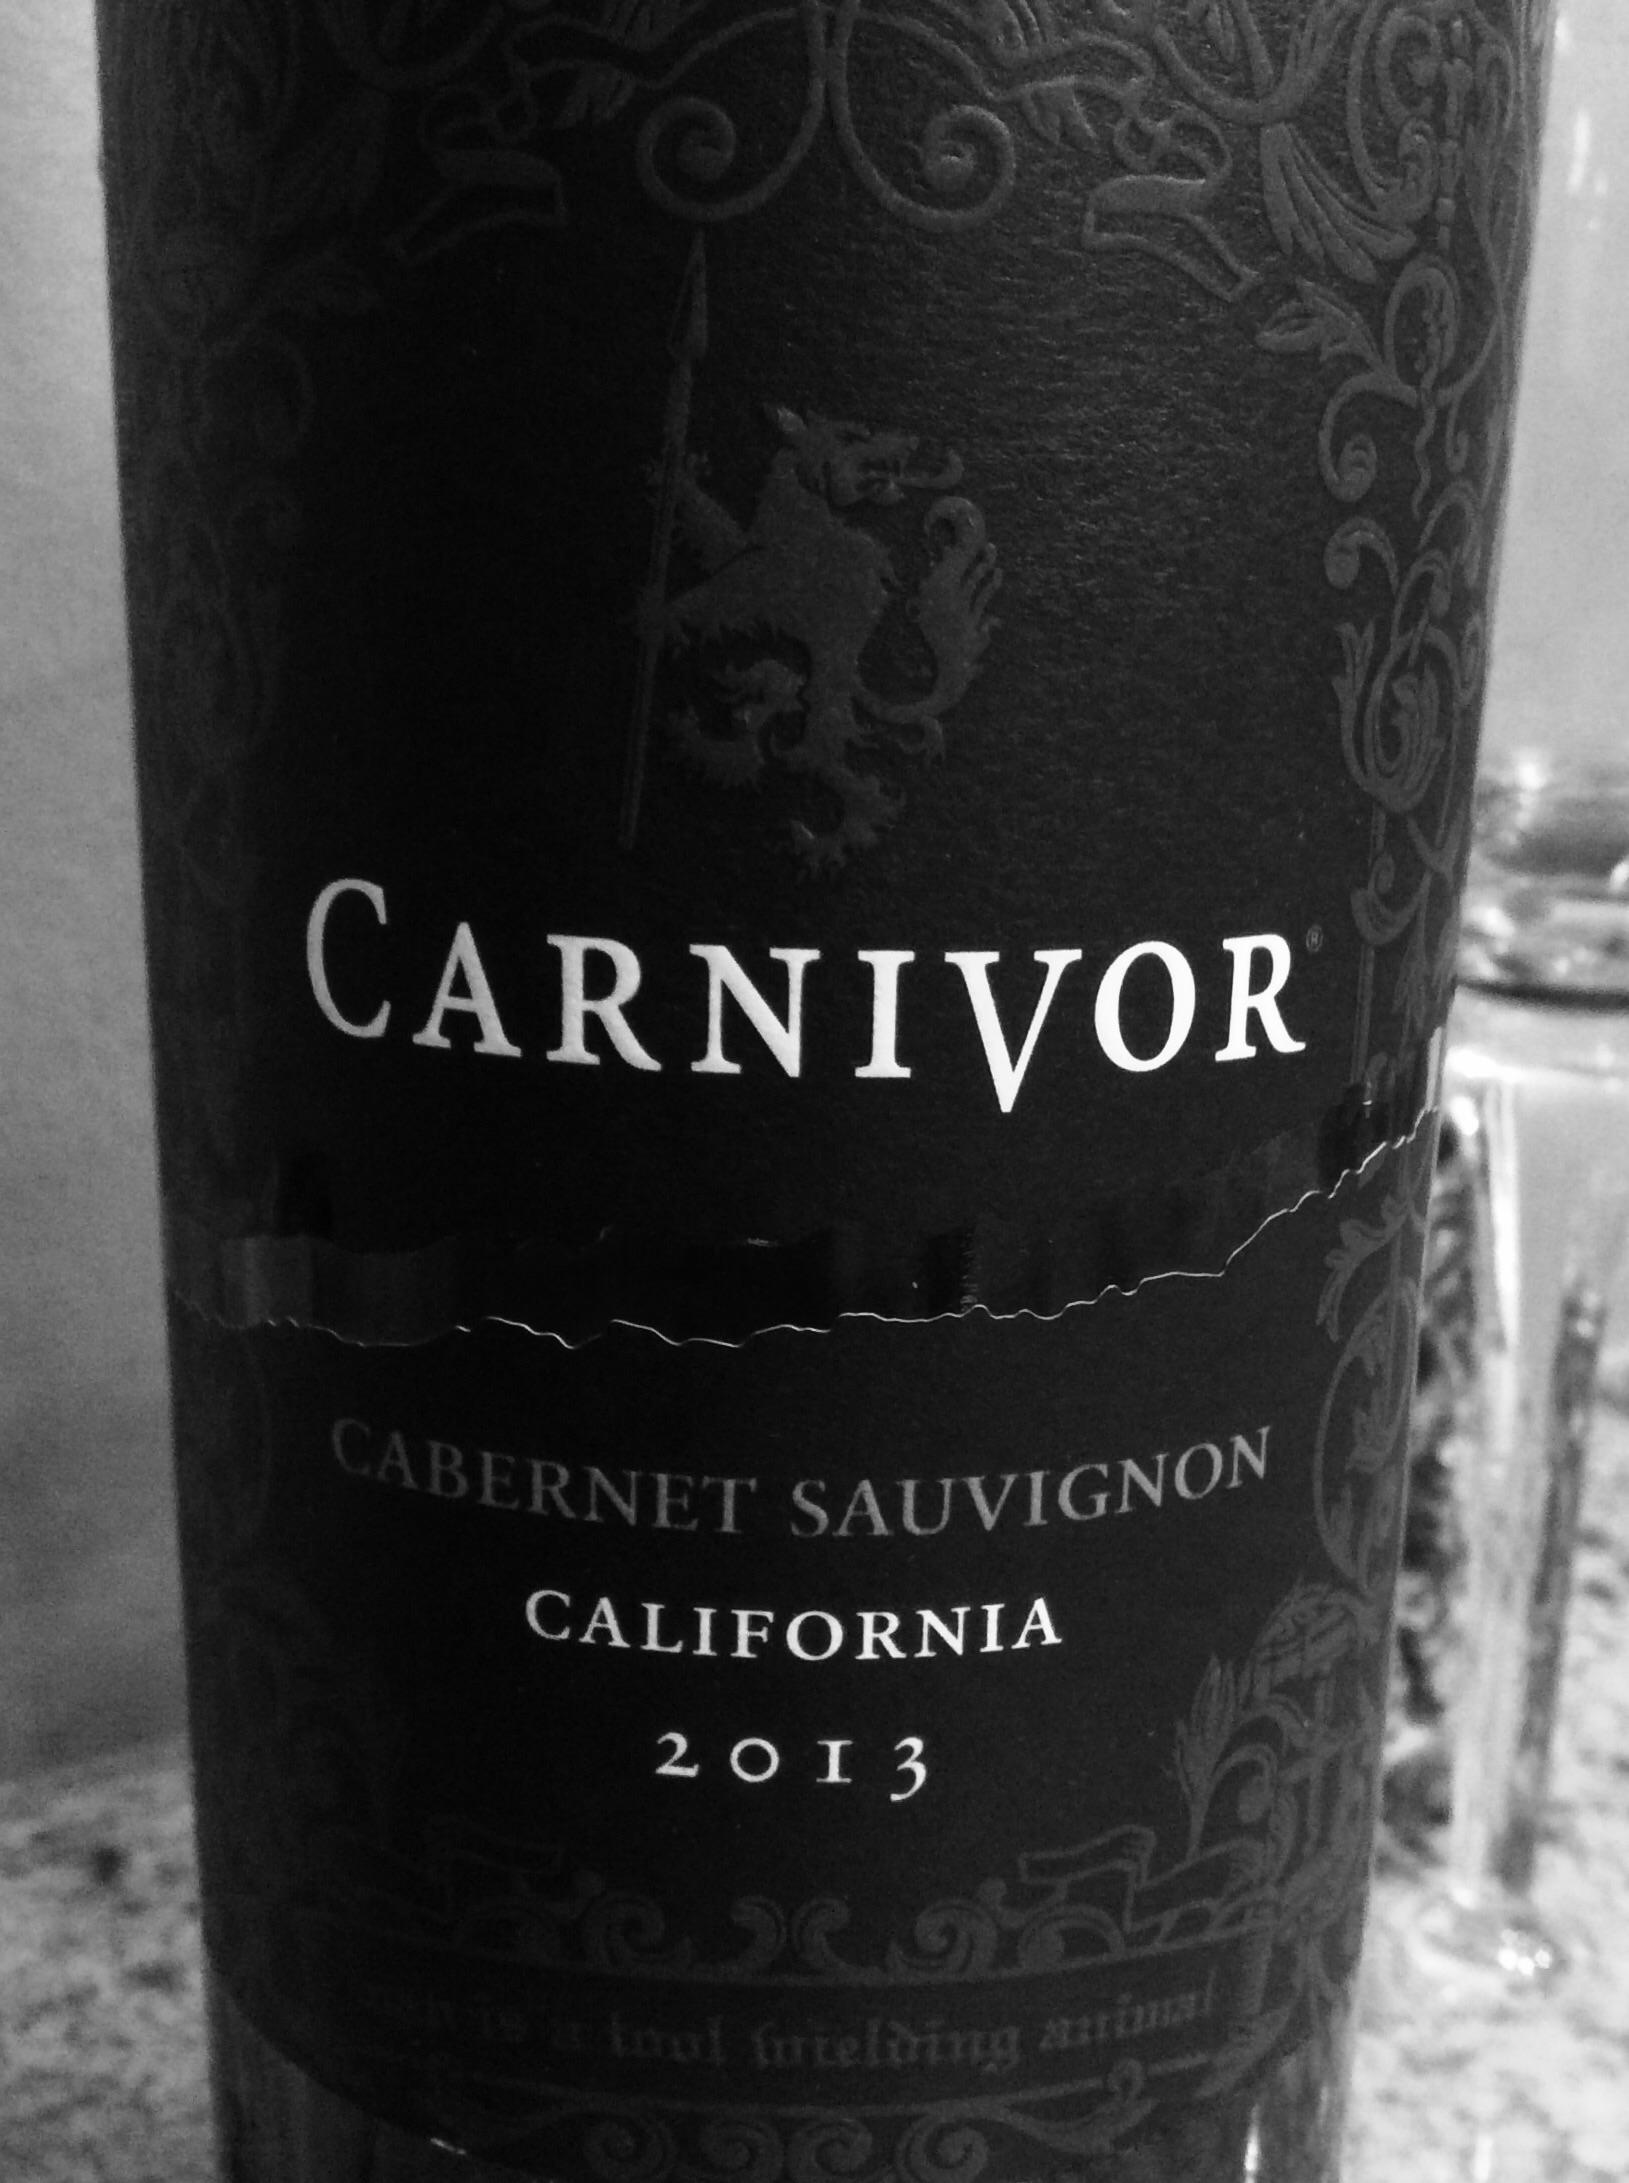 cabernet 2013 carnivor sauvignon